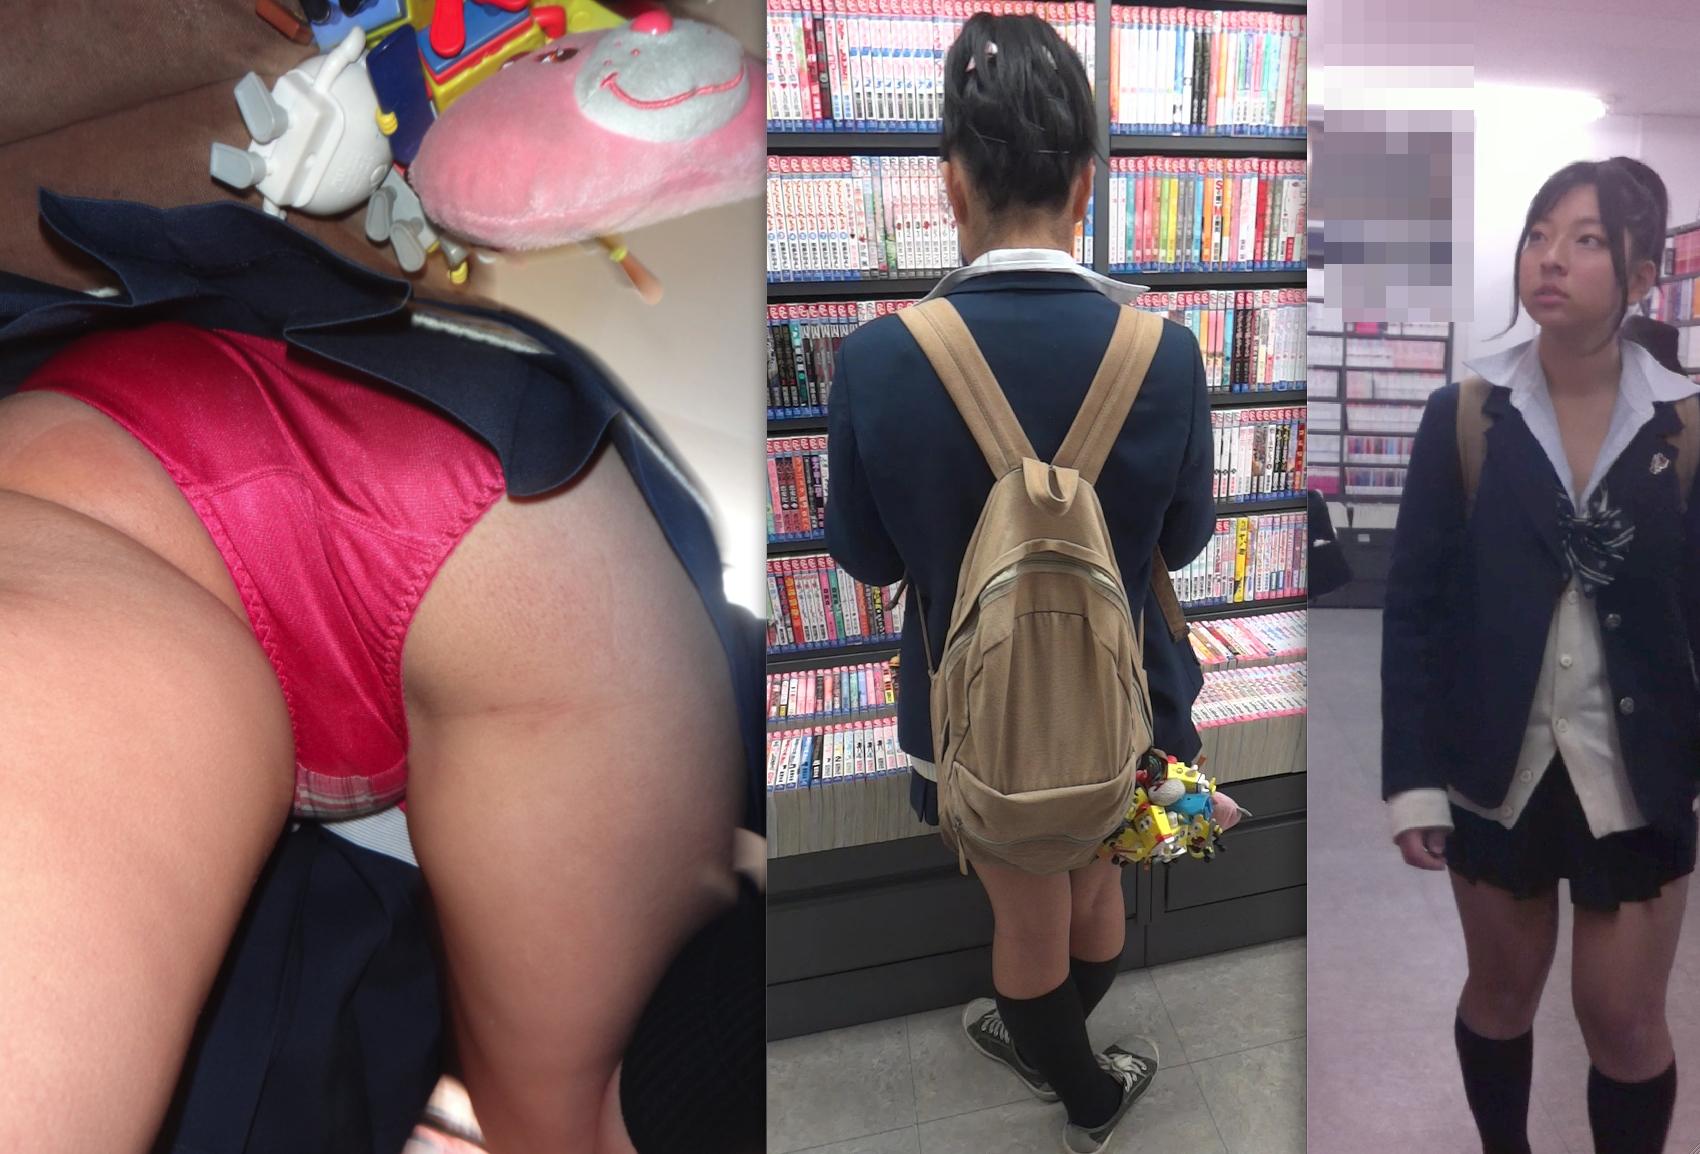 【JK逆さ撮りエロ画像】ブック○フで立ち読みしている素人女子校生の生々しいパンツが至高www